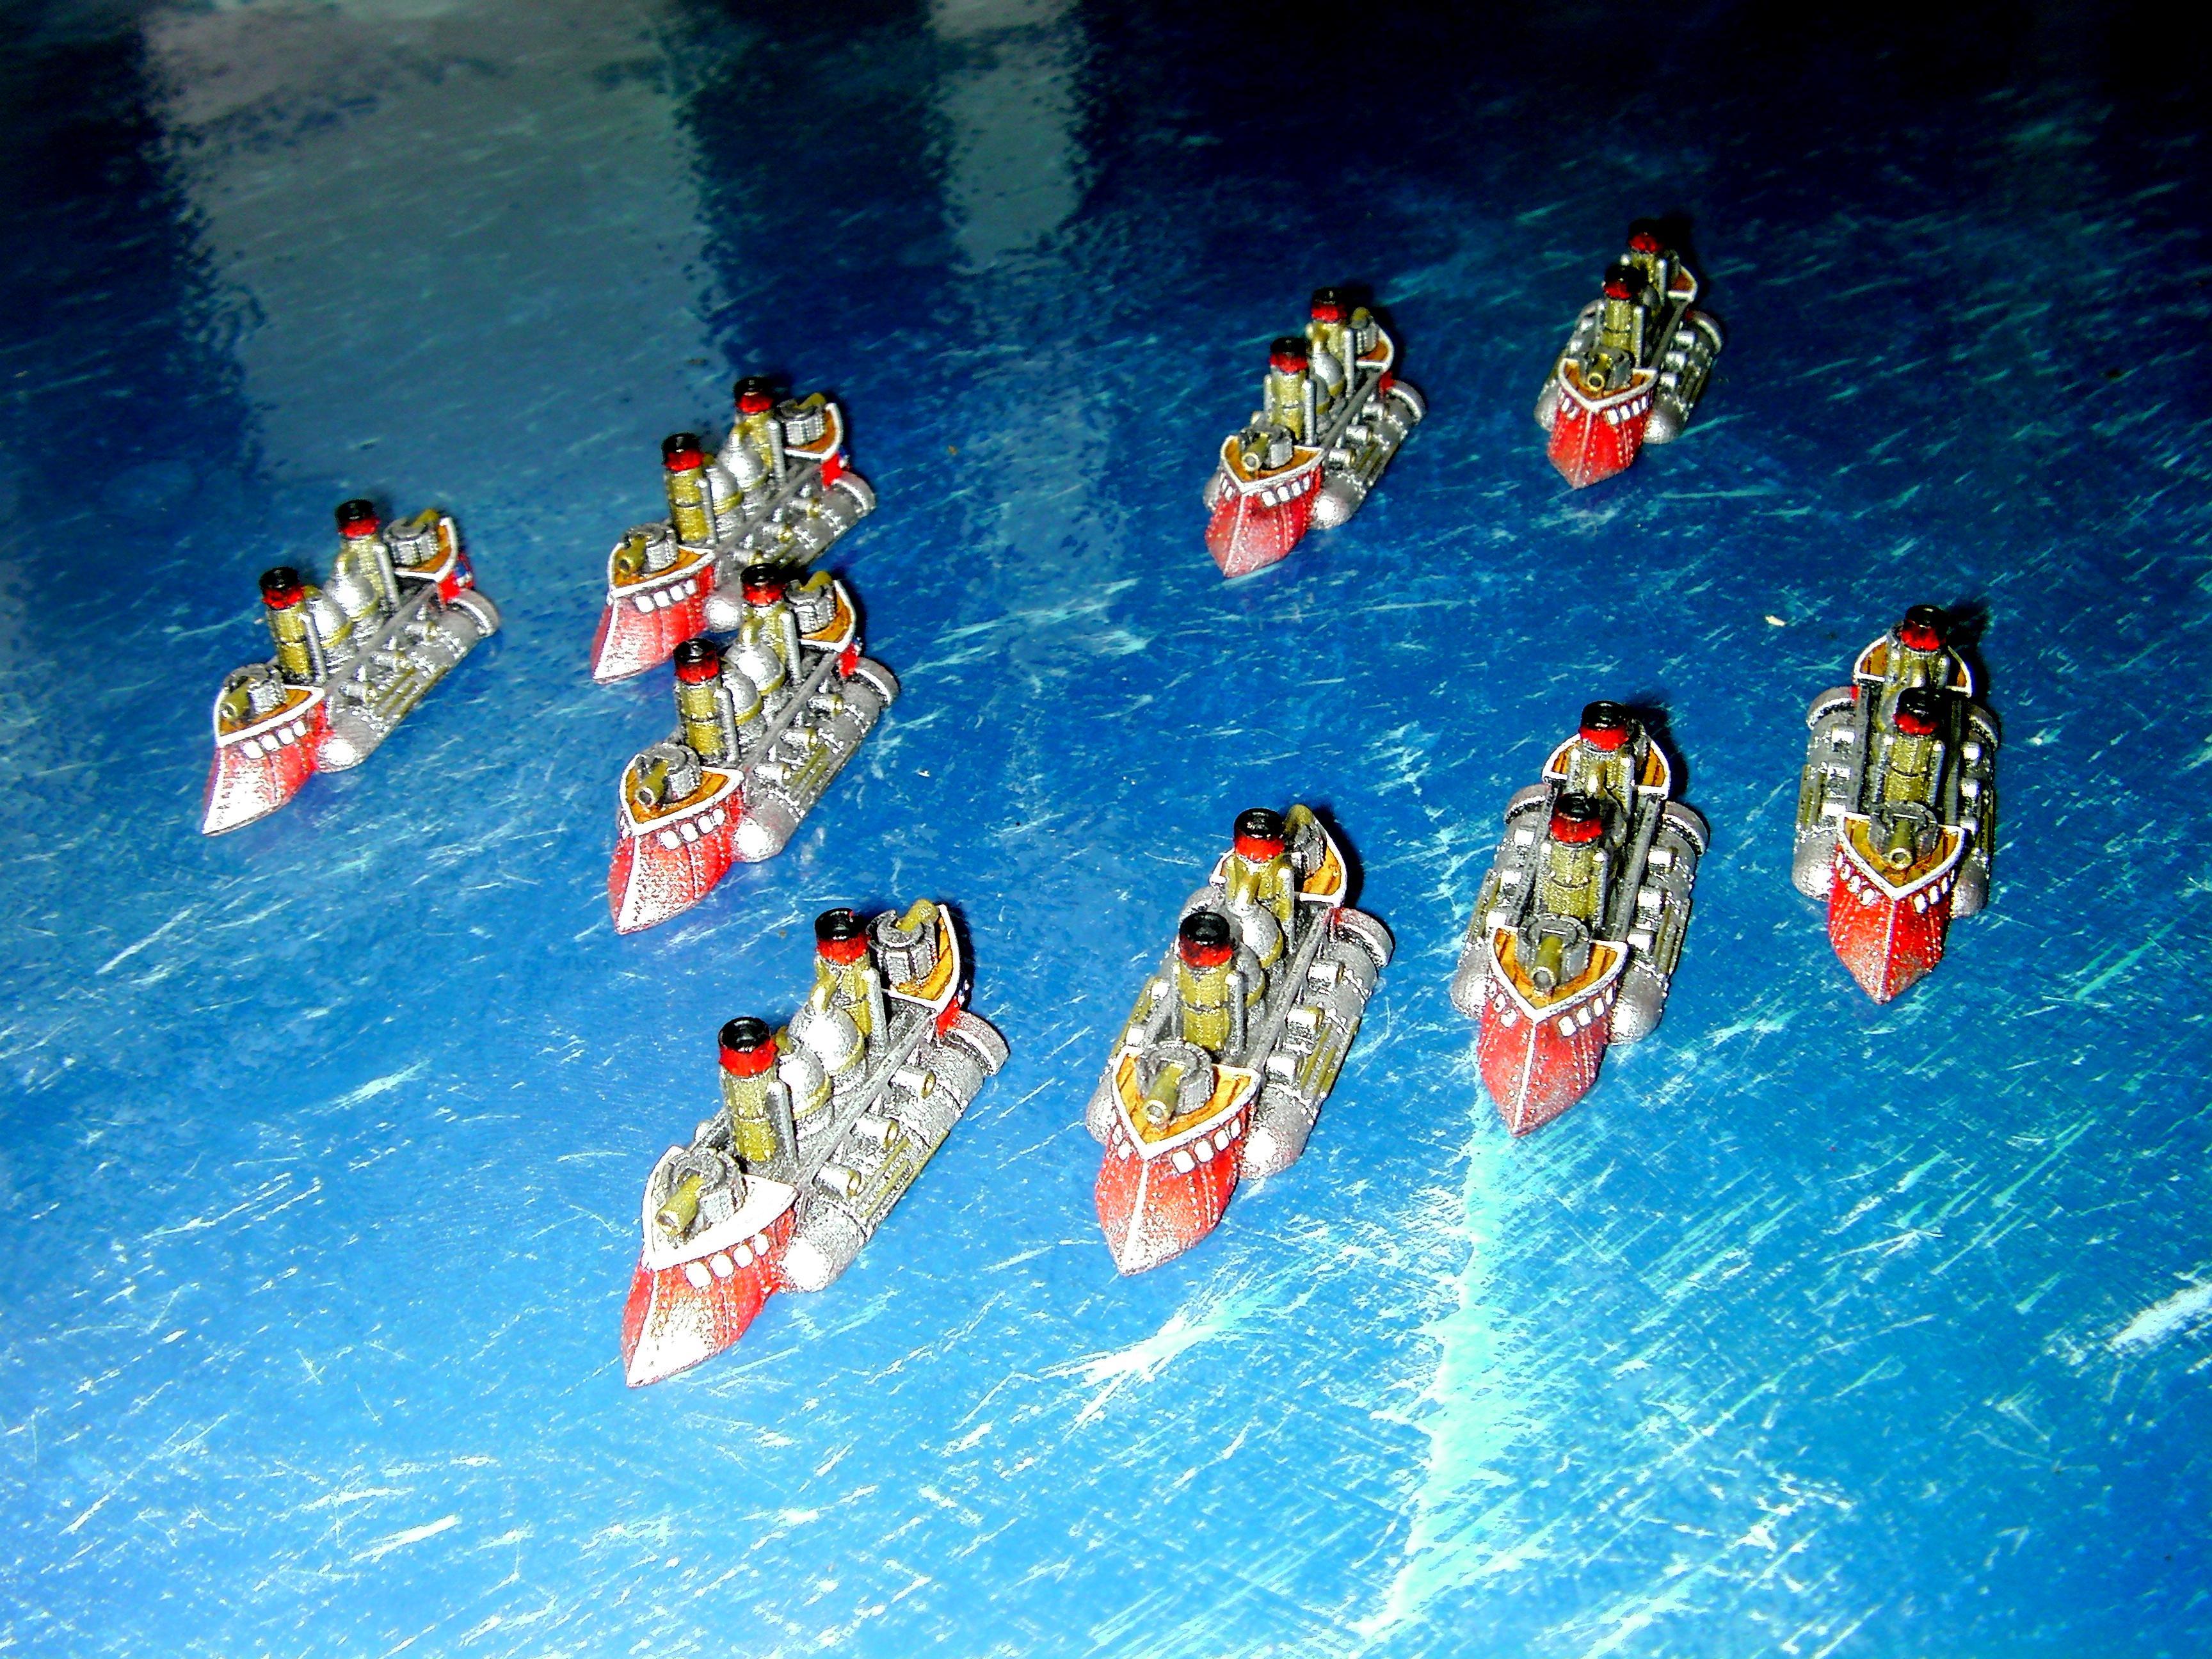 Attacker, Attacker Class, English Frigate, Frigate, Kingdom Of Britannia Frigate, Kob